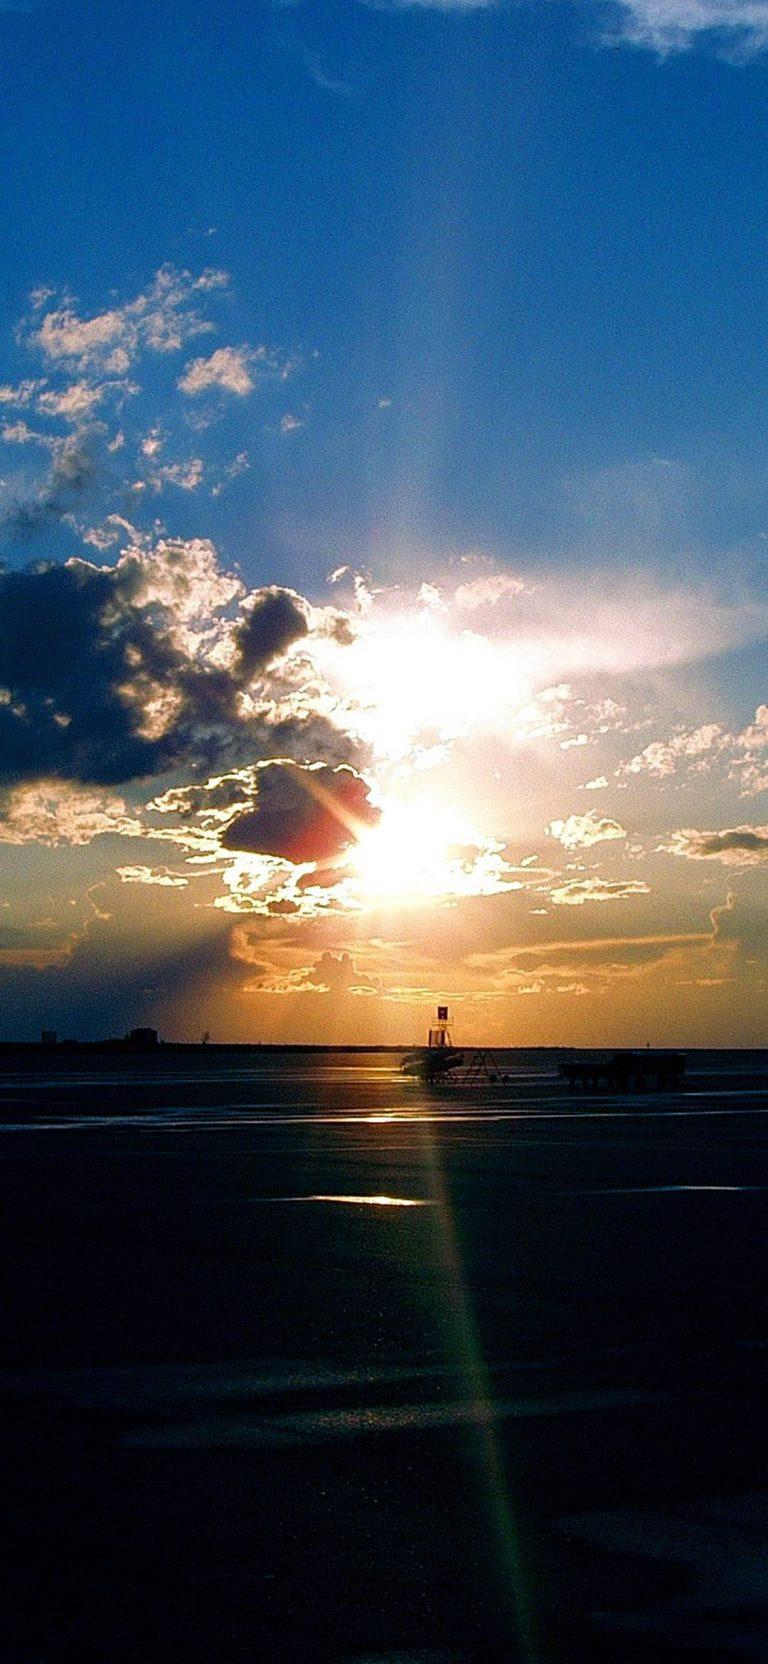 Airport-Sunset-1080x2340-768x1664 - 50+ Free Xiaomi Mi CC9 Phone Wallpapers [year]